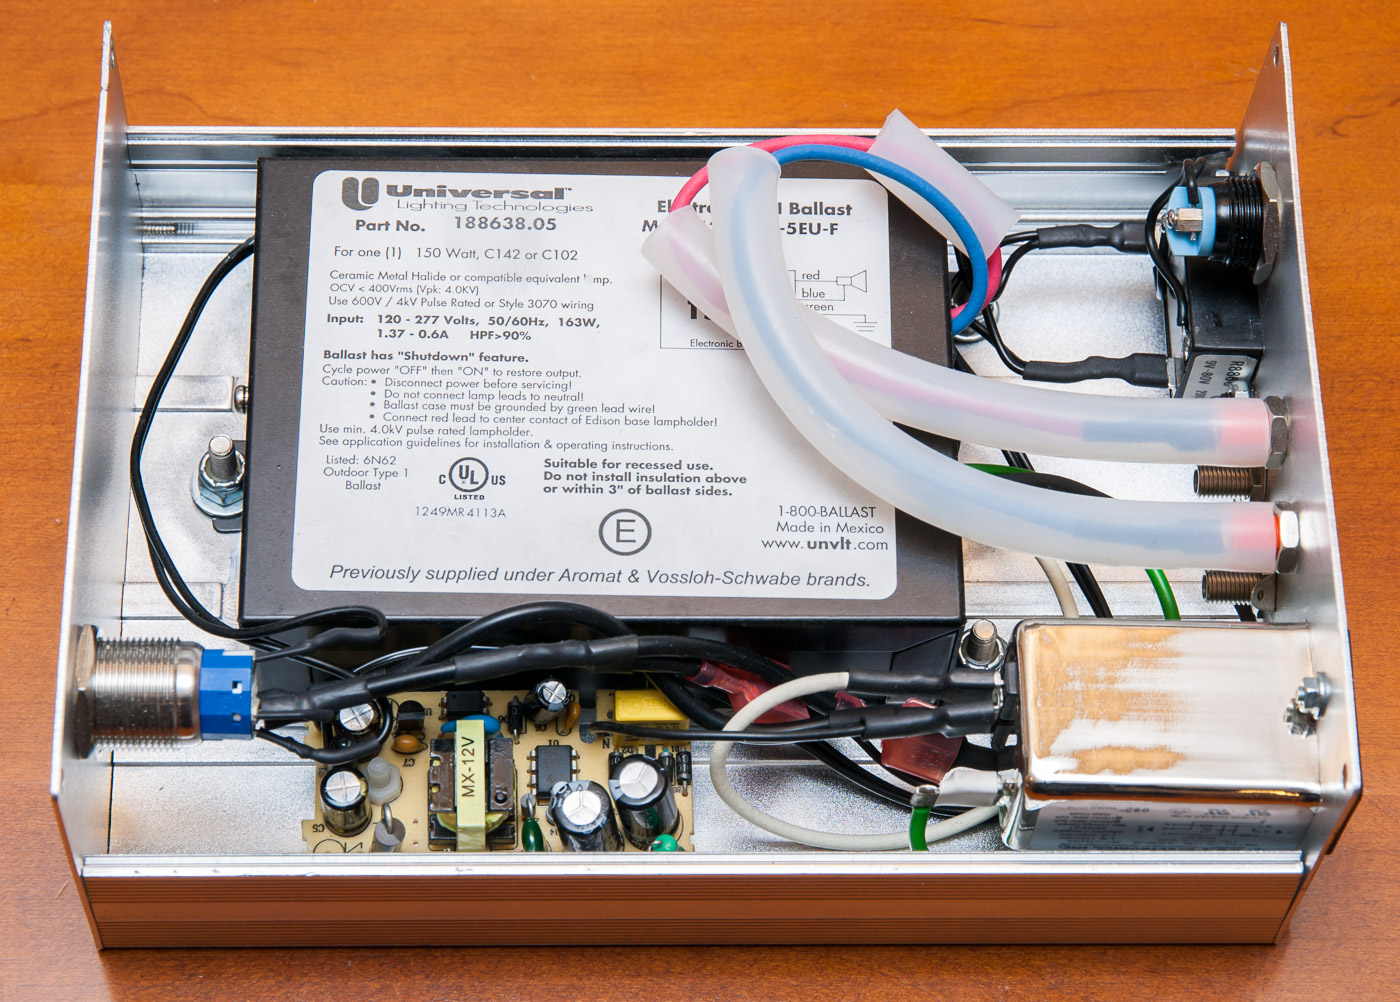 480v ballast wiring diagram 120v ballast wiring diagram